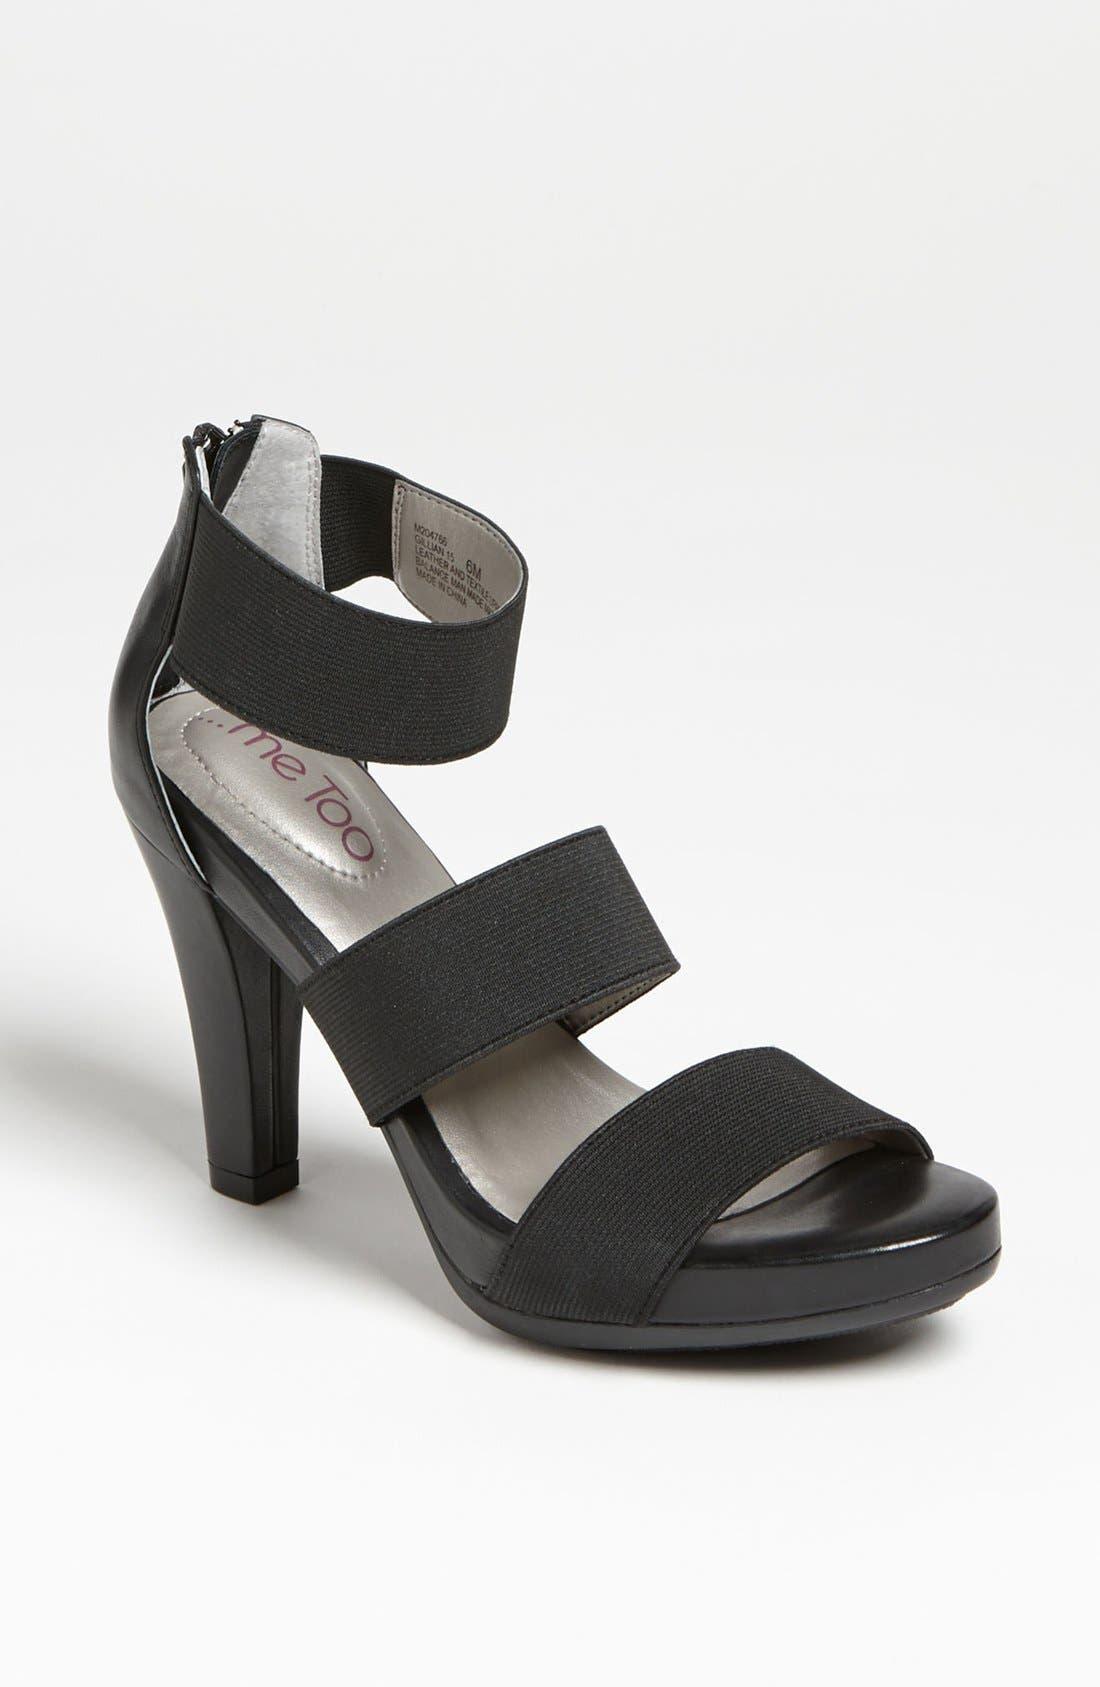 Main Image - Me Too 'Gillian' Sandal